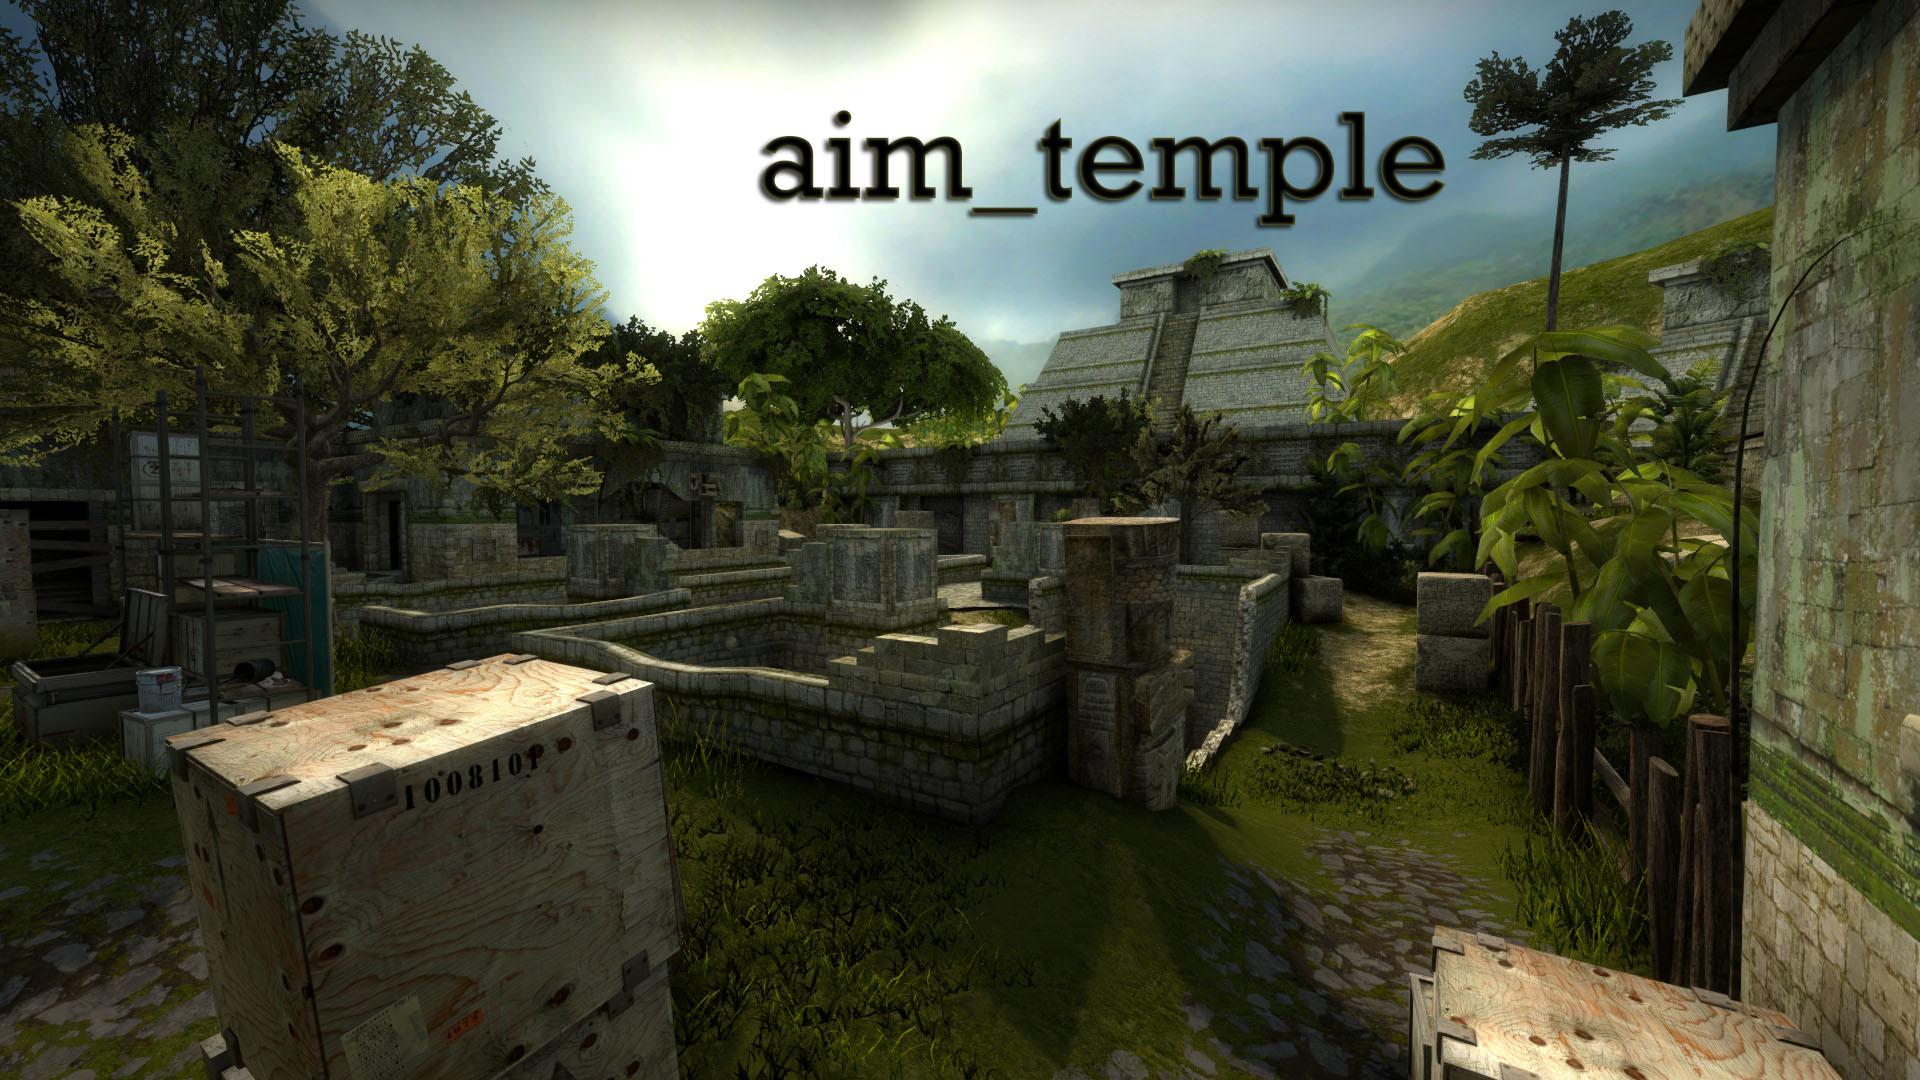 aim_temple_front.jpg